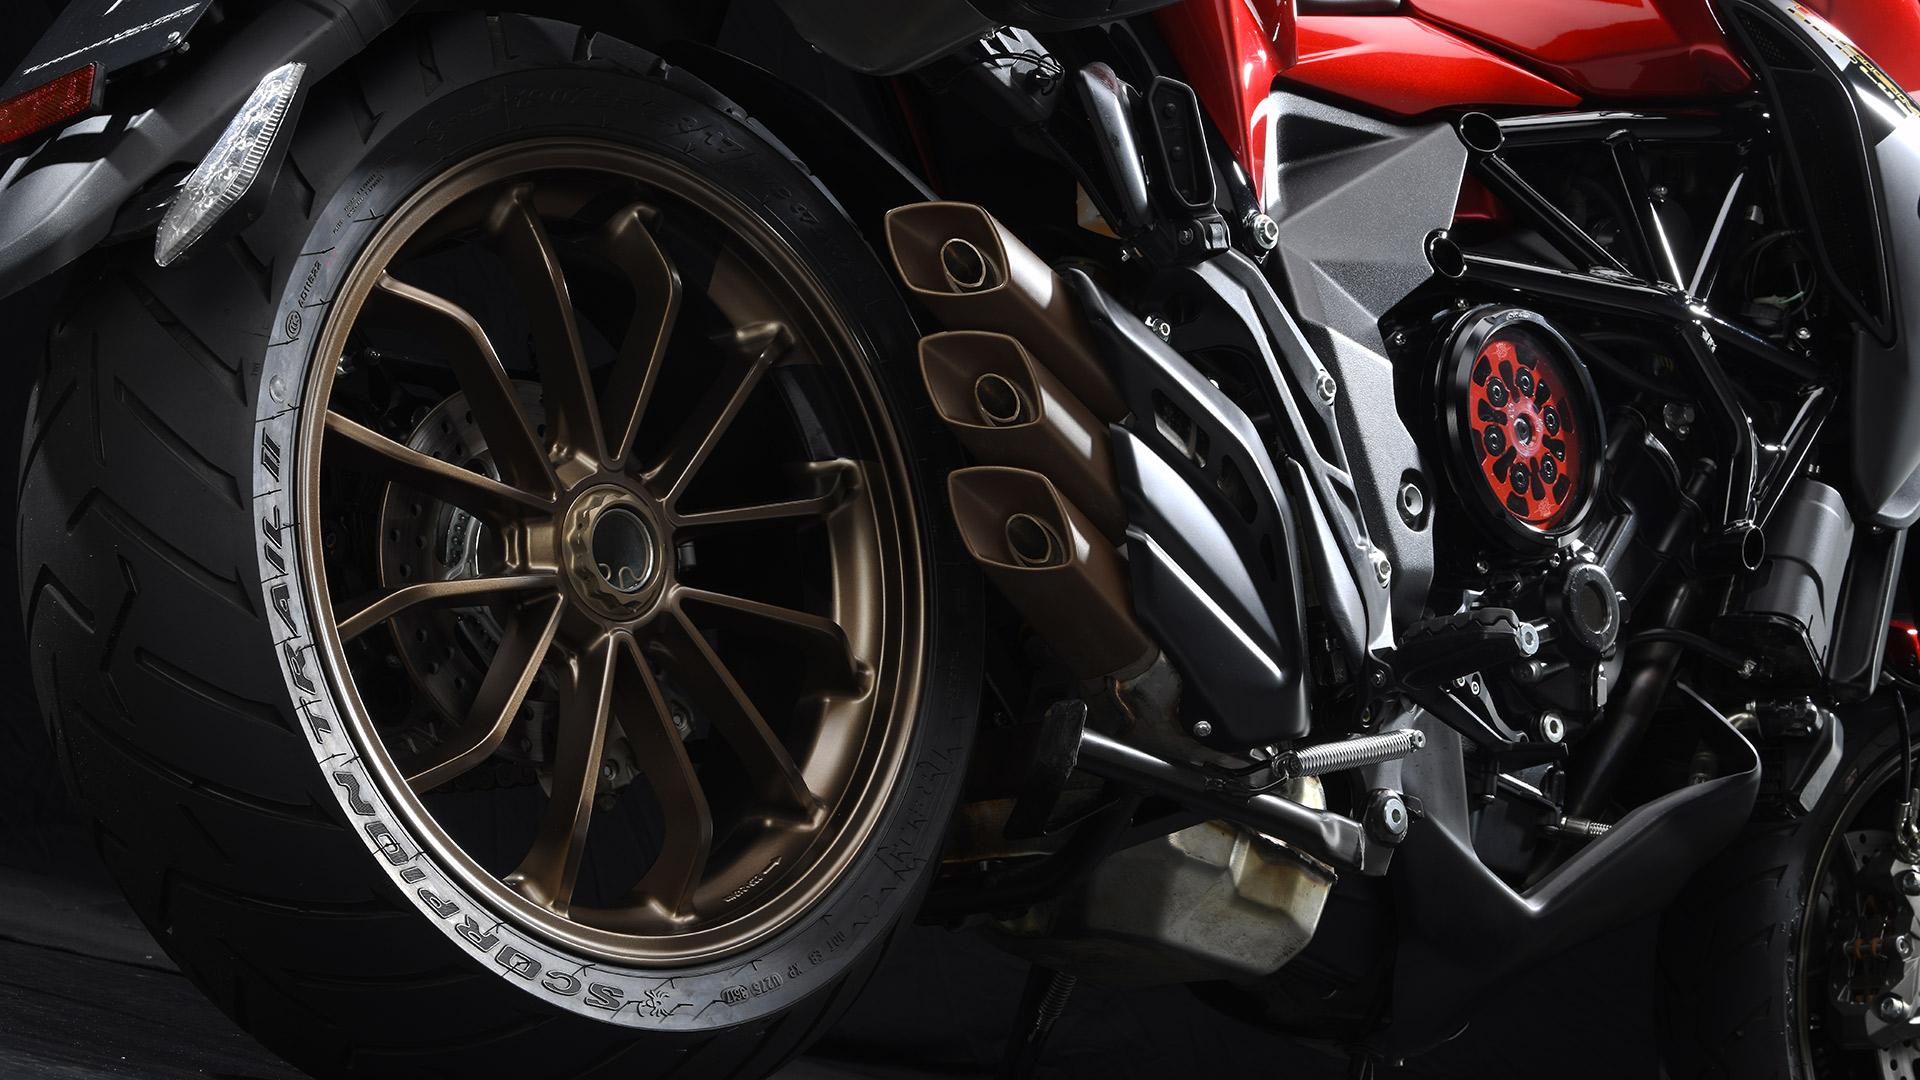 MV Agusta Turismo Veloce Lusso SCS Engine